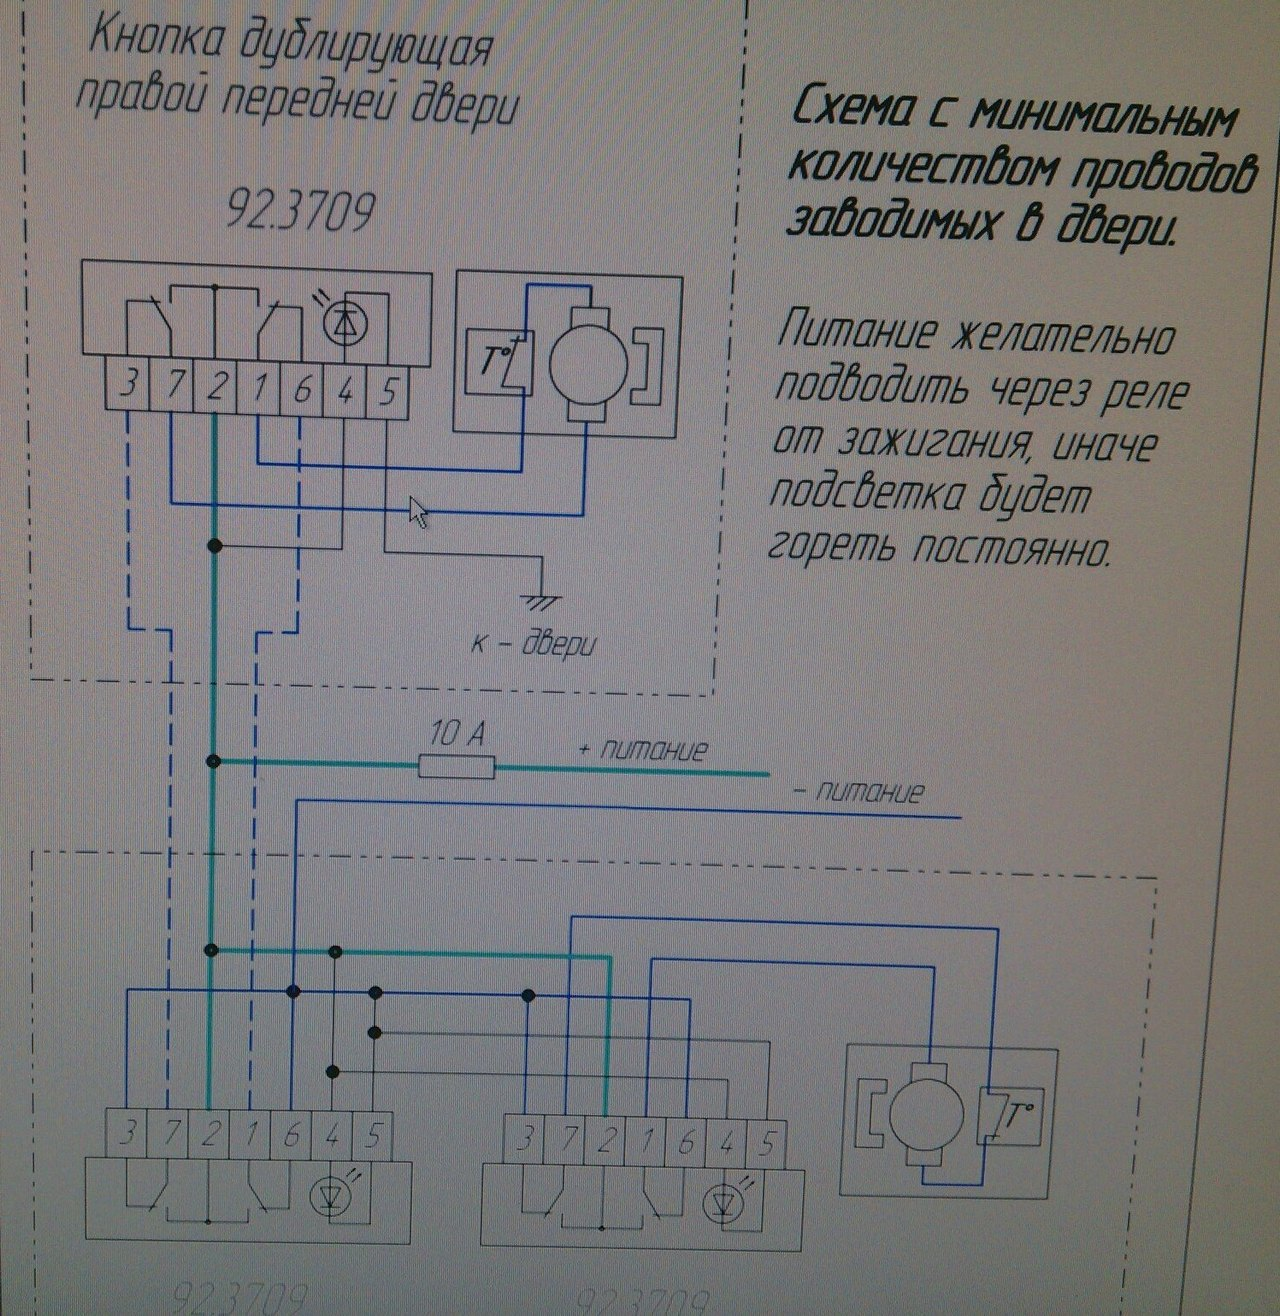 Установка электрических стеклоподъемников ГРАНАТ в передние двери ВАЗ-21099. Рис. 14